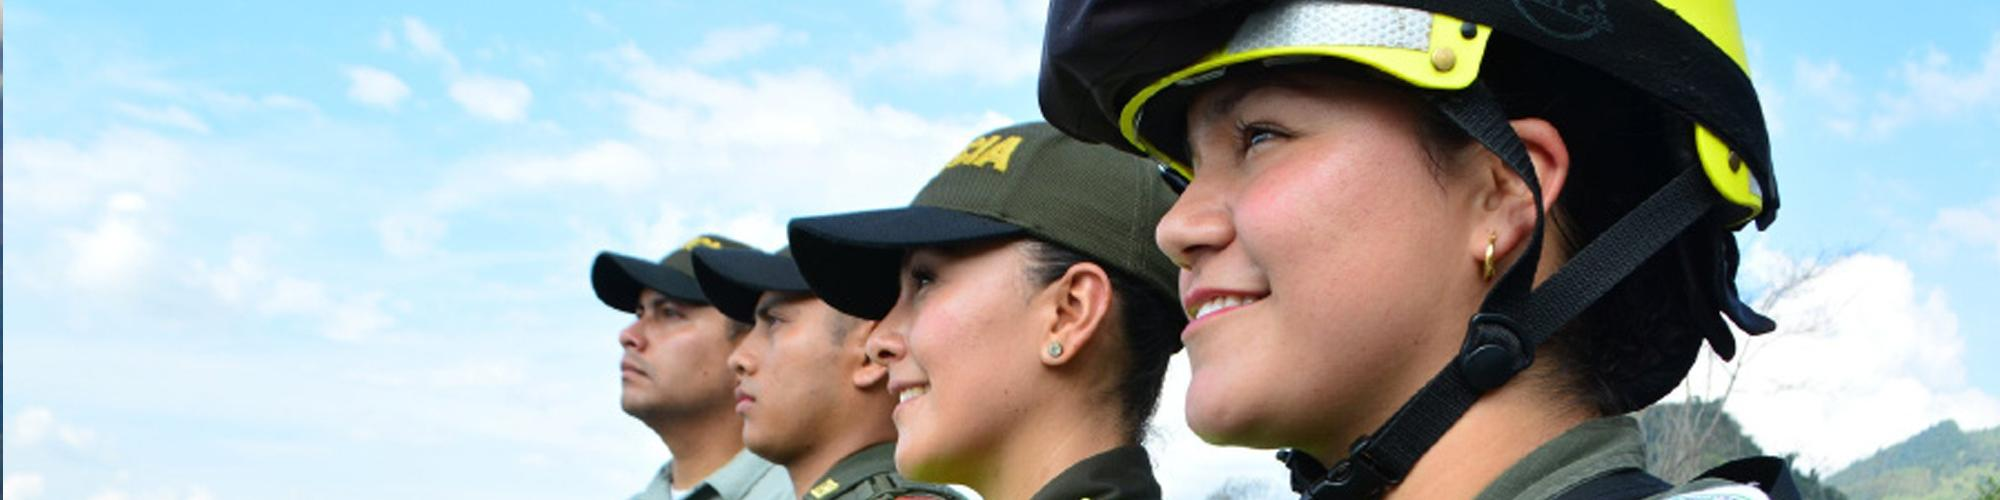 Especialidades policía